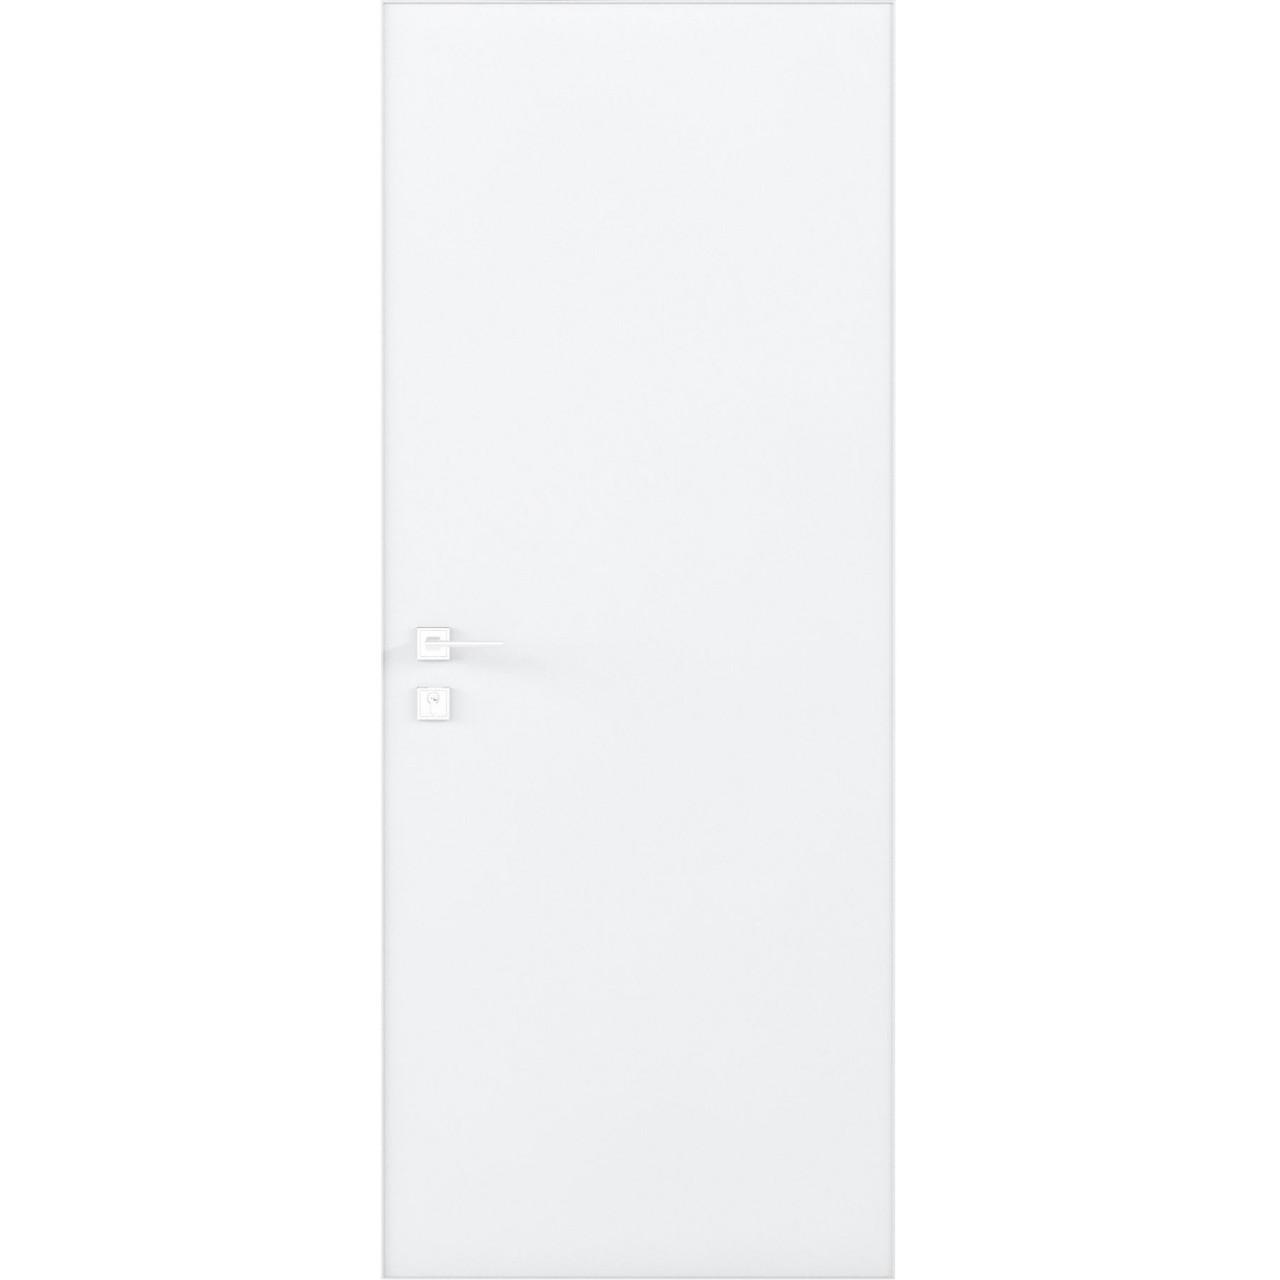 Двері прихованого монтажу Rodos Кортес Prima Alum Біла матова (полотно)